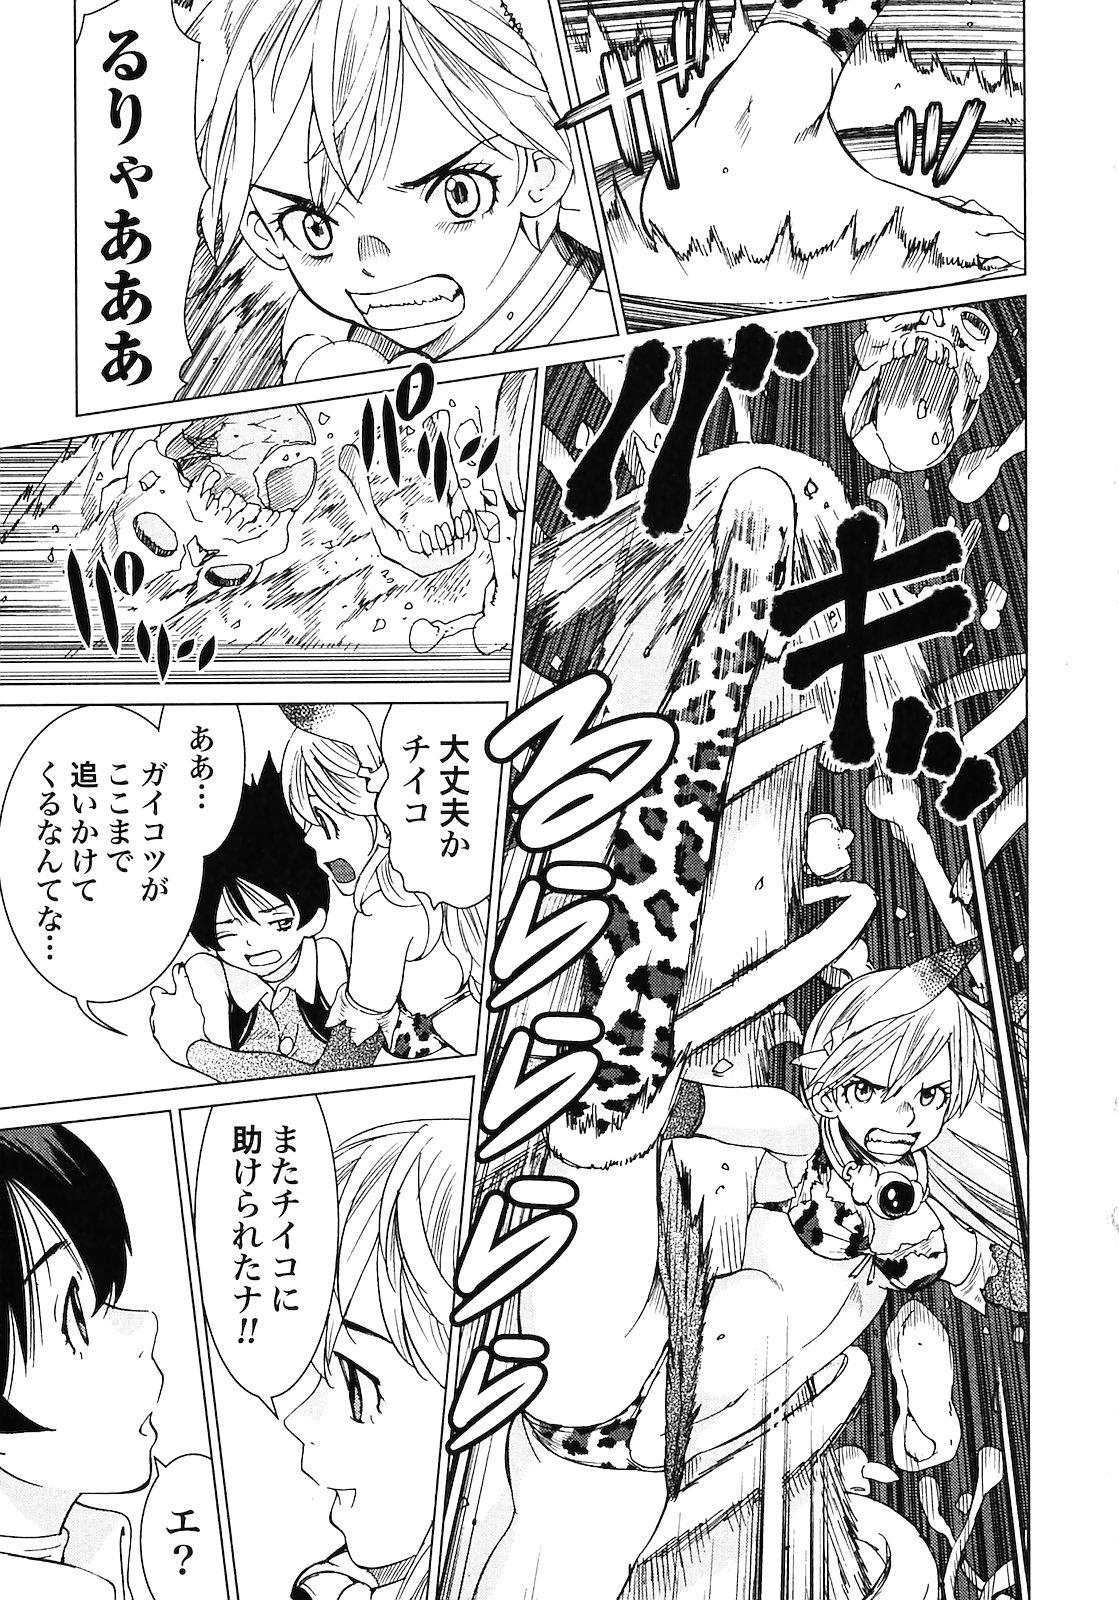 Makyo no Shanana Vol.02 182